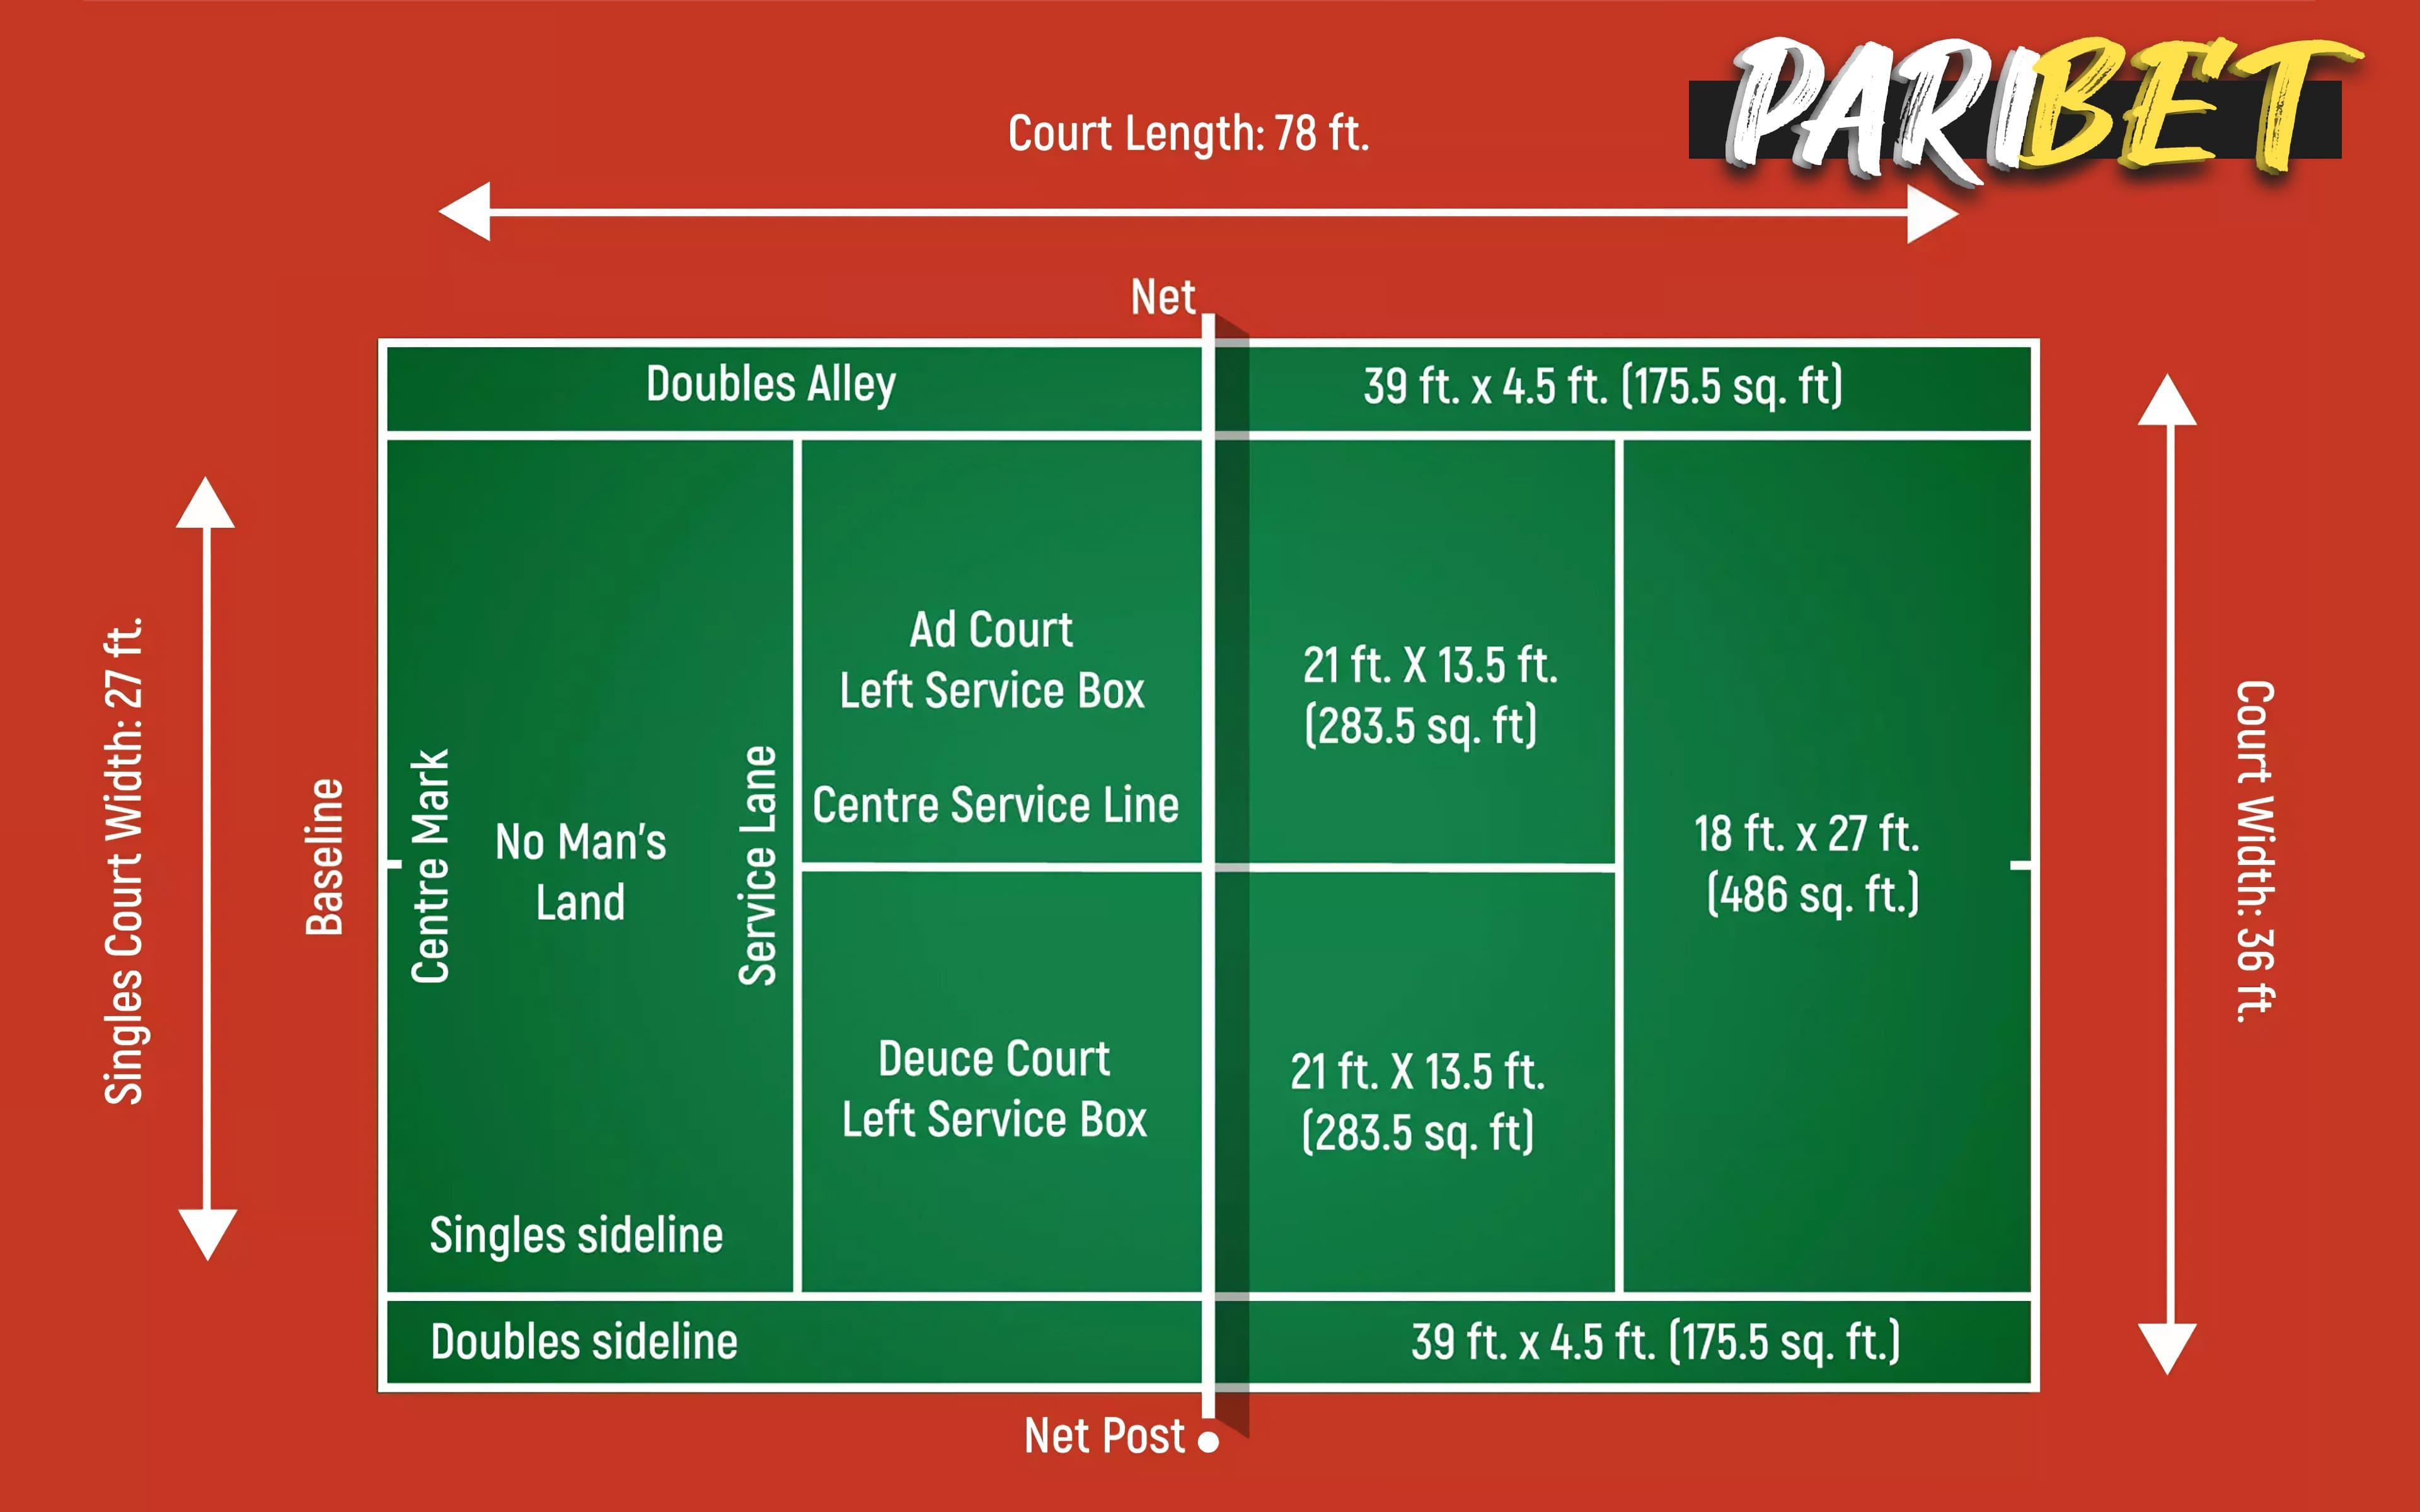 Tennis betting with Paribet